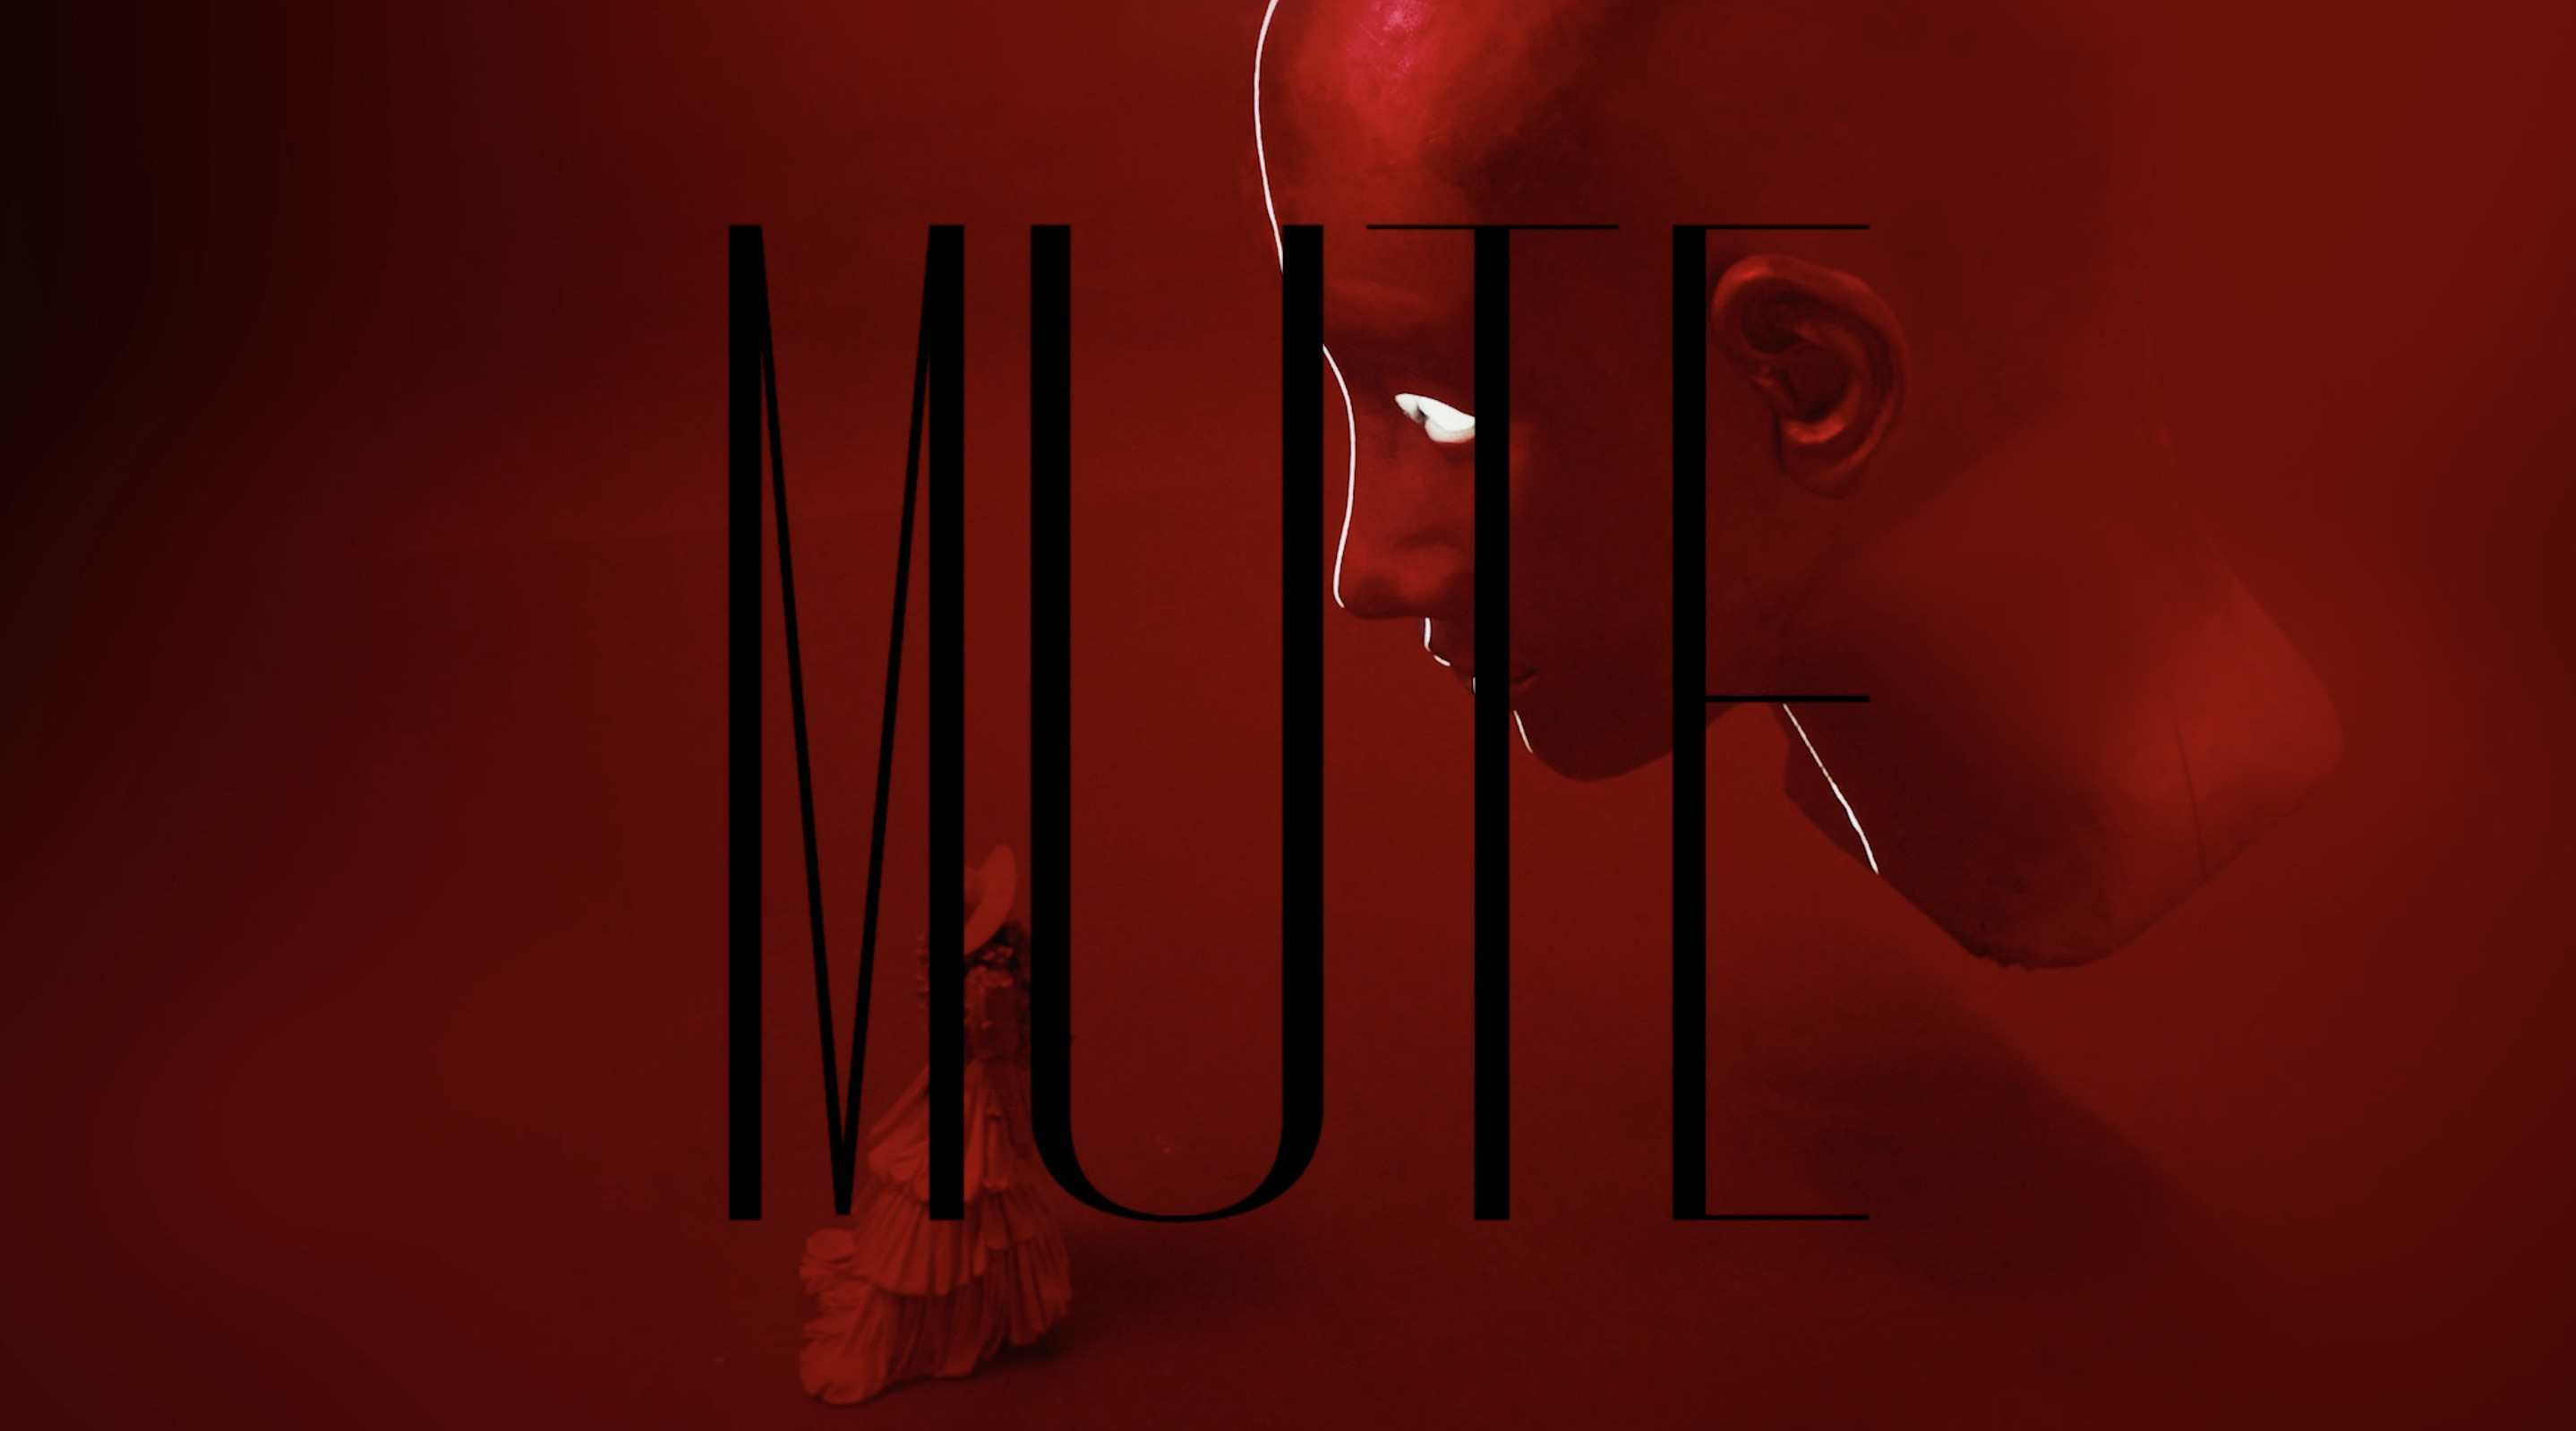 孟美岐 'MUTE' Official MV